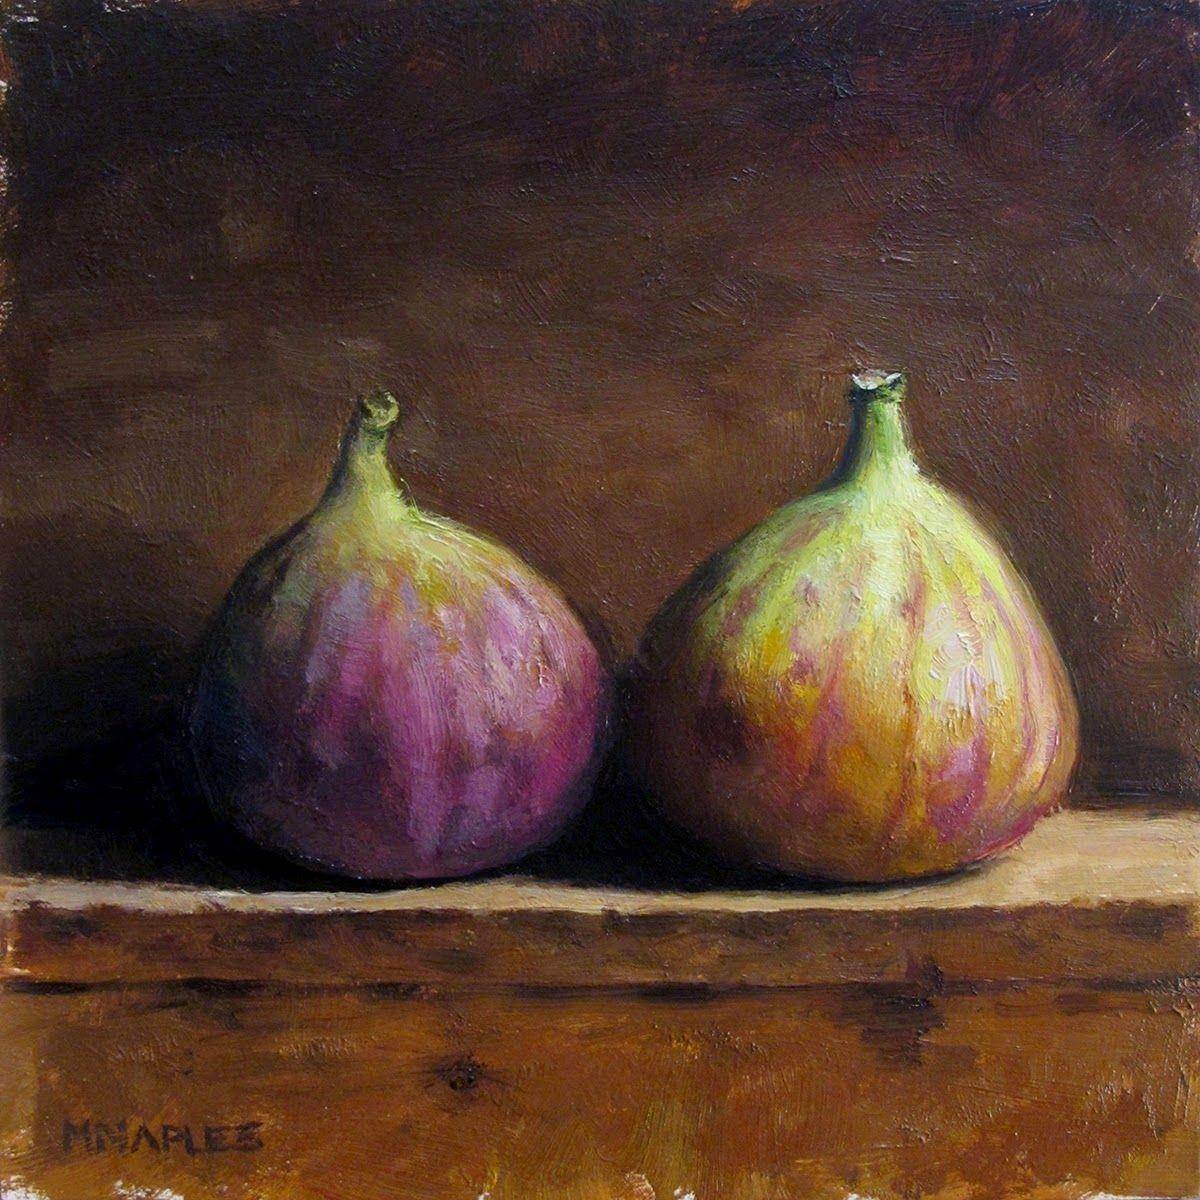 MICHAEL NAPLES   Arte de la pintura   Pinterest   Stillleben ...